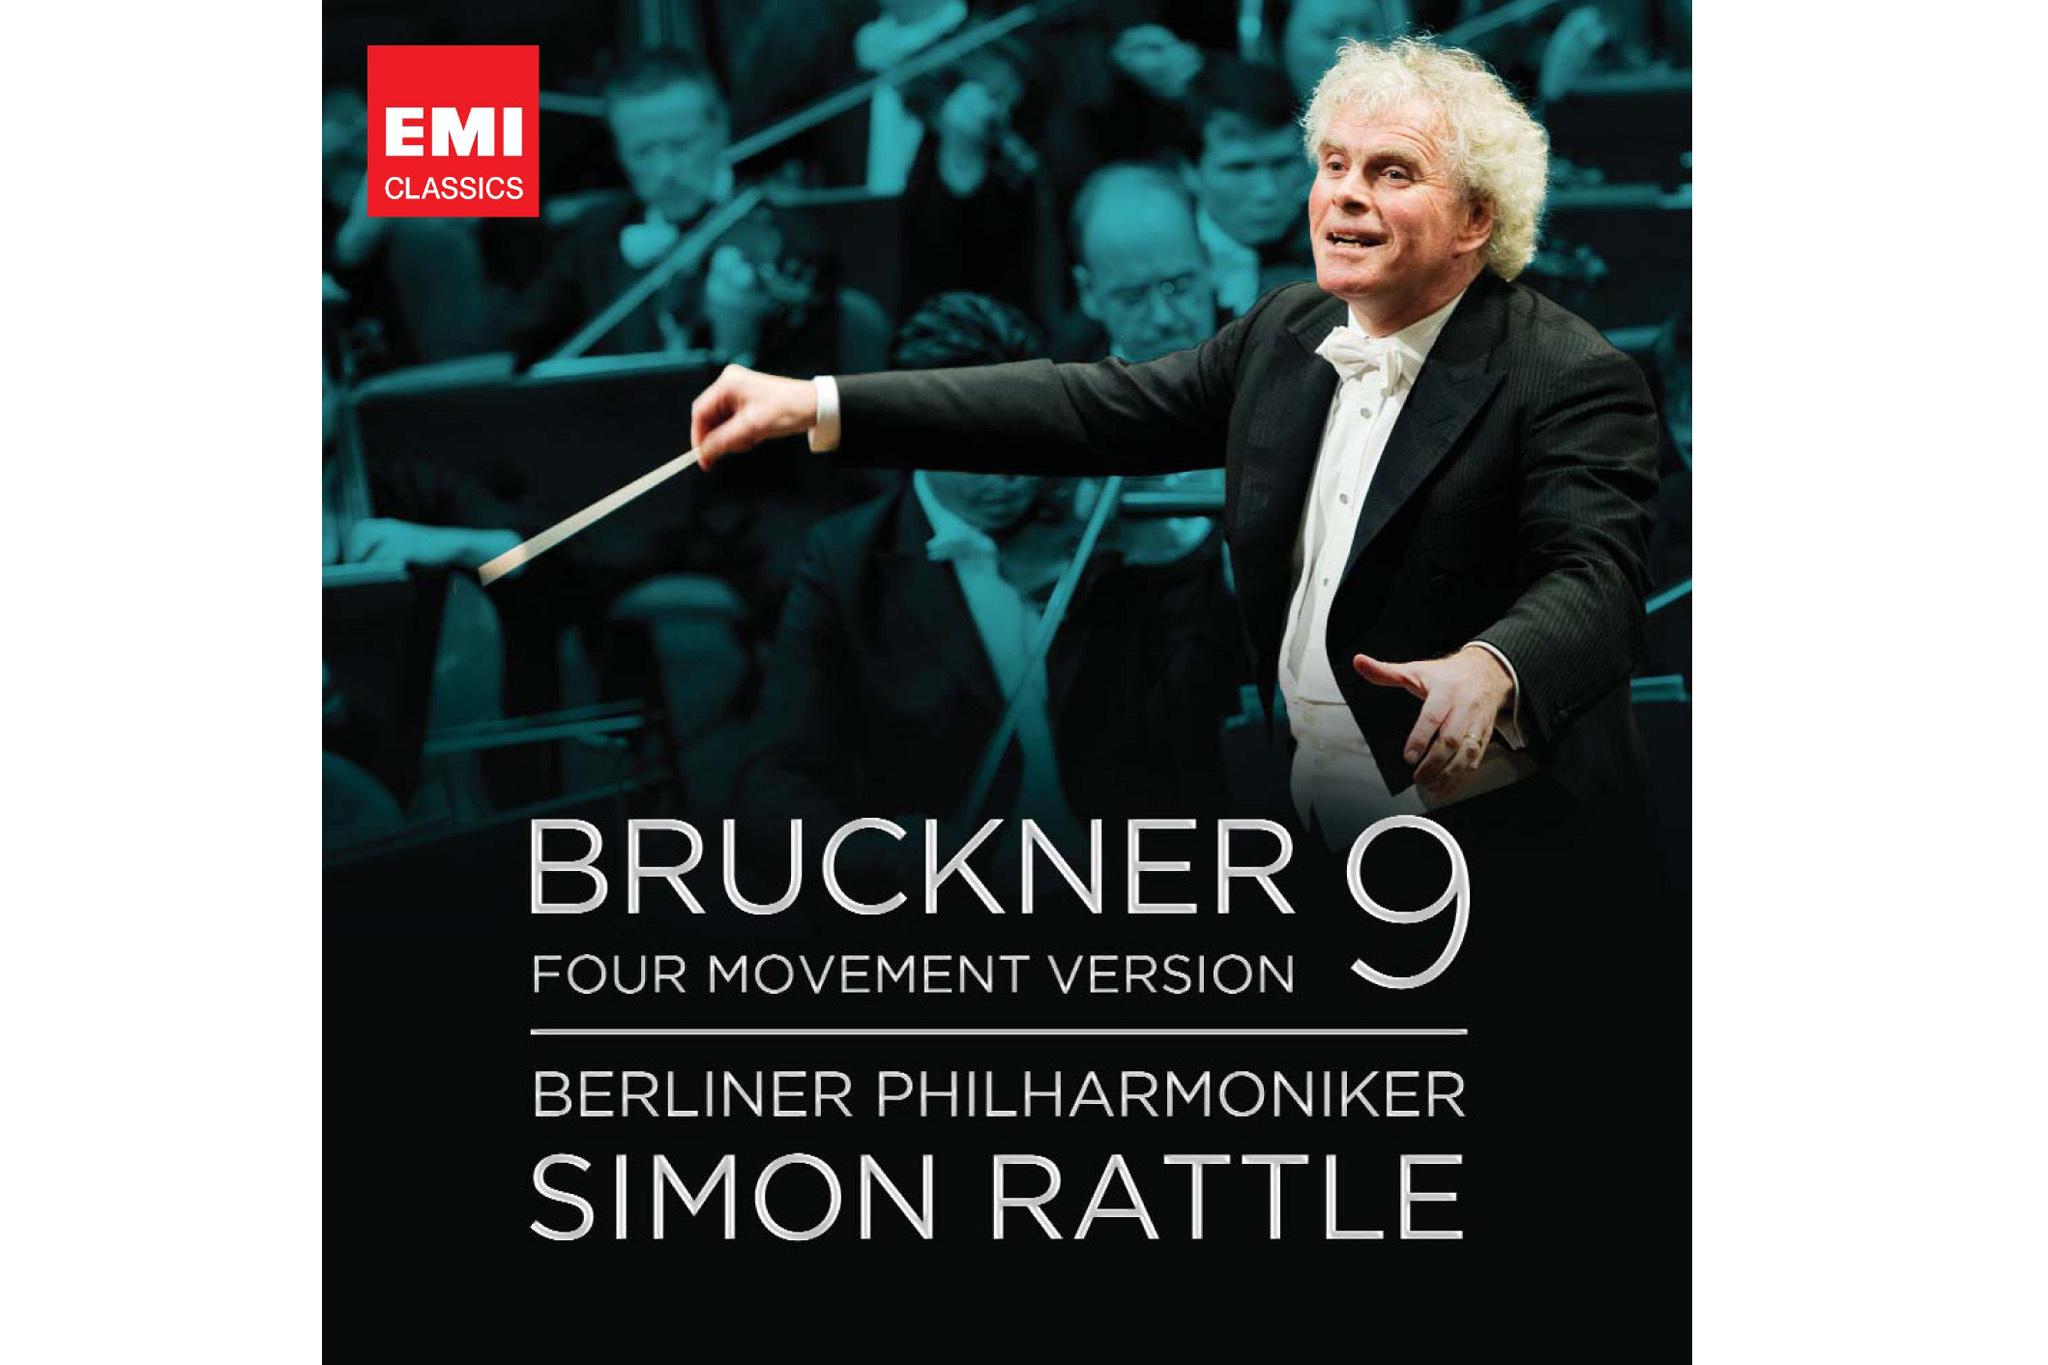 Anton Bruckner, Symphony No. 9